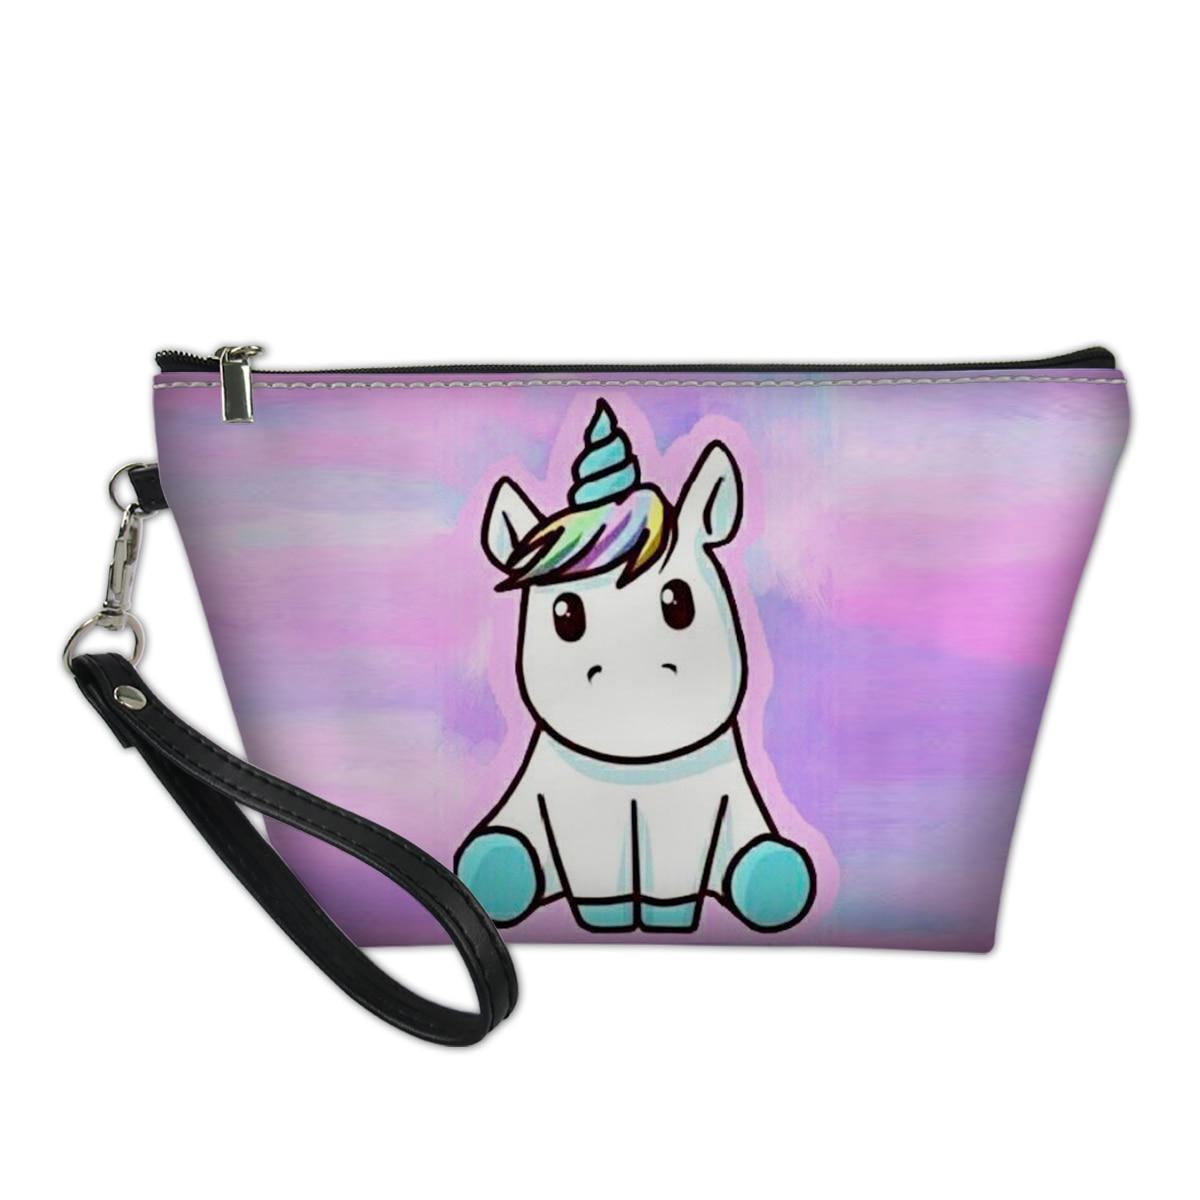 Thikin 2020 Kawaii Unicorn Casual Pencil Bags Pen Bag For Boys Pen Case Student Makeup Storage Handbags Cartoon Pattern Case